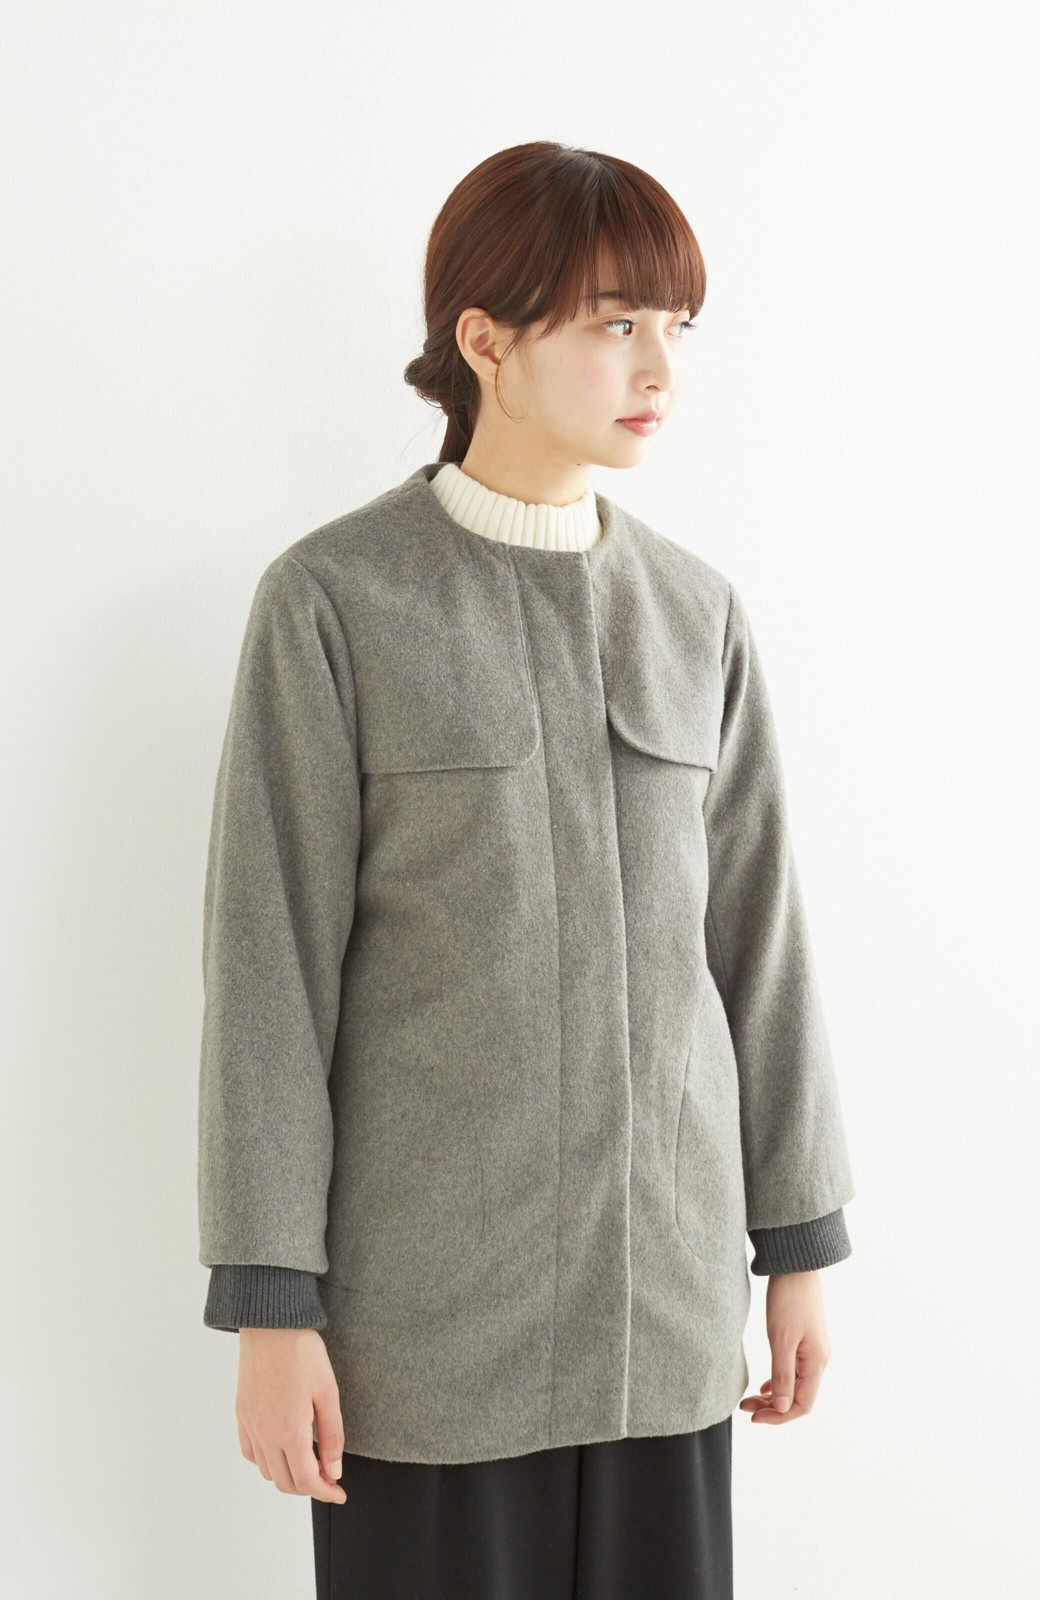 pilvee 取り外しフェイクファー衿付き ウール混のノーカラーコート <グレー>の商品写真16